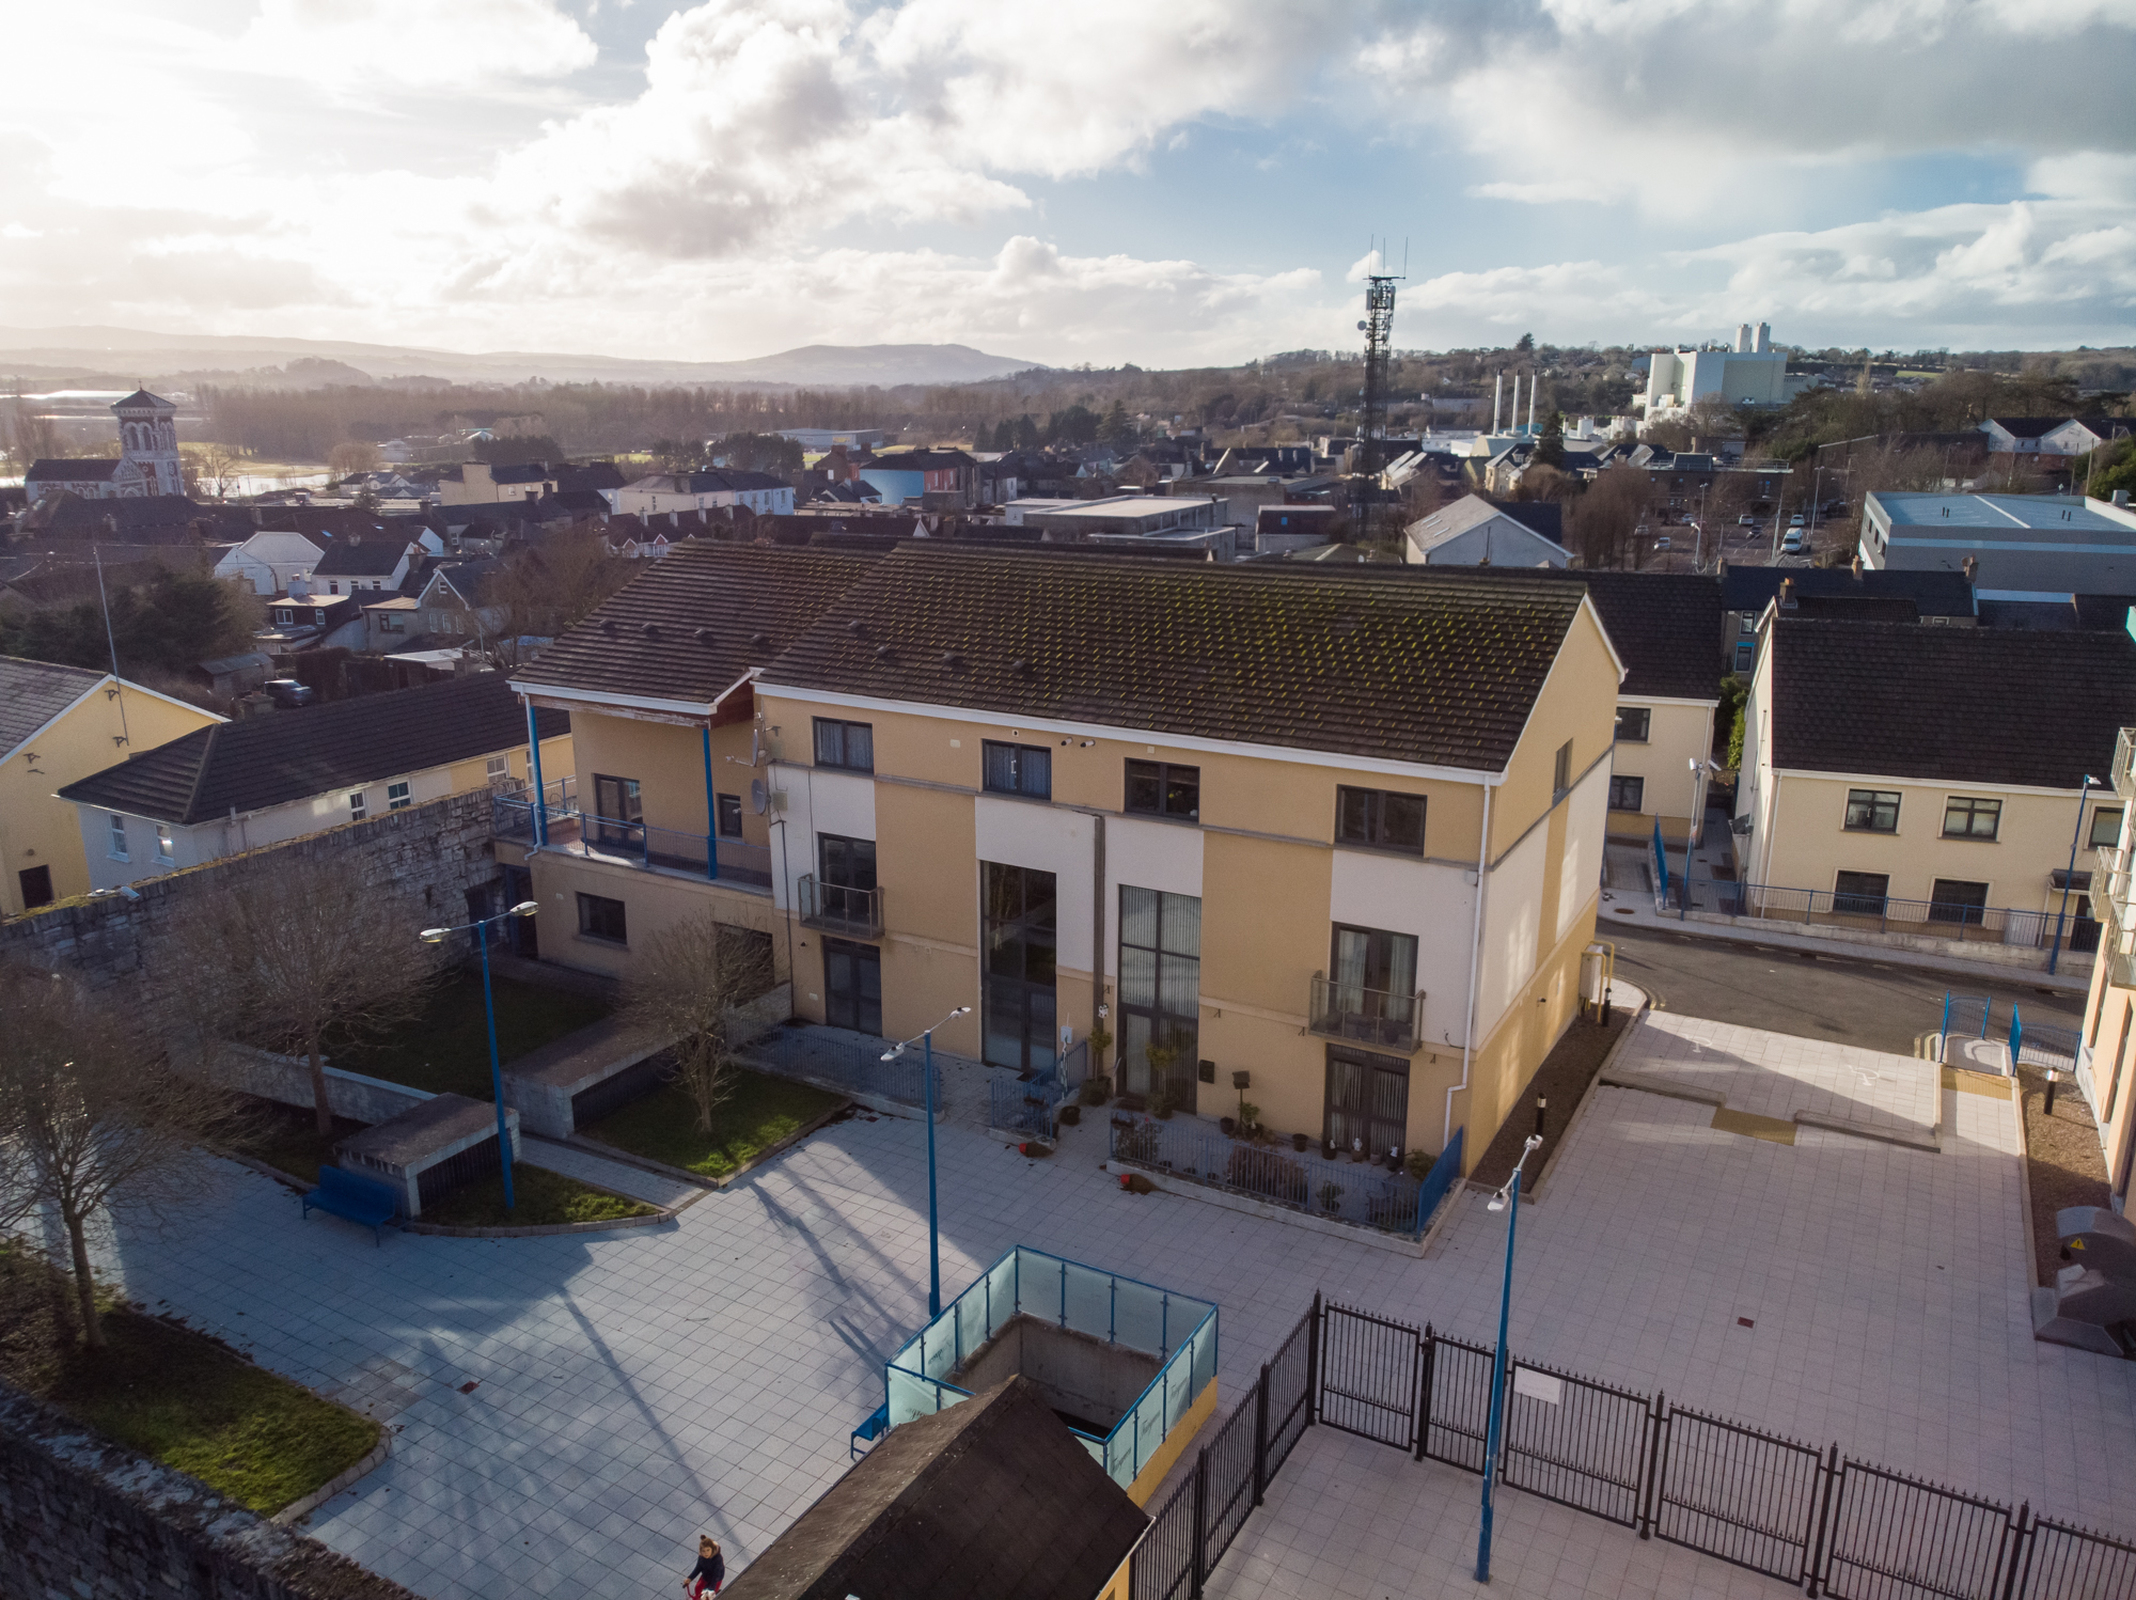 3 Plaza View, Fairgreen, Mallow, Co. Cork